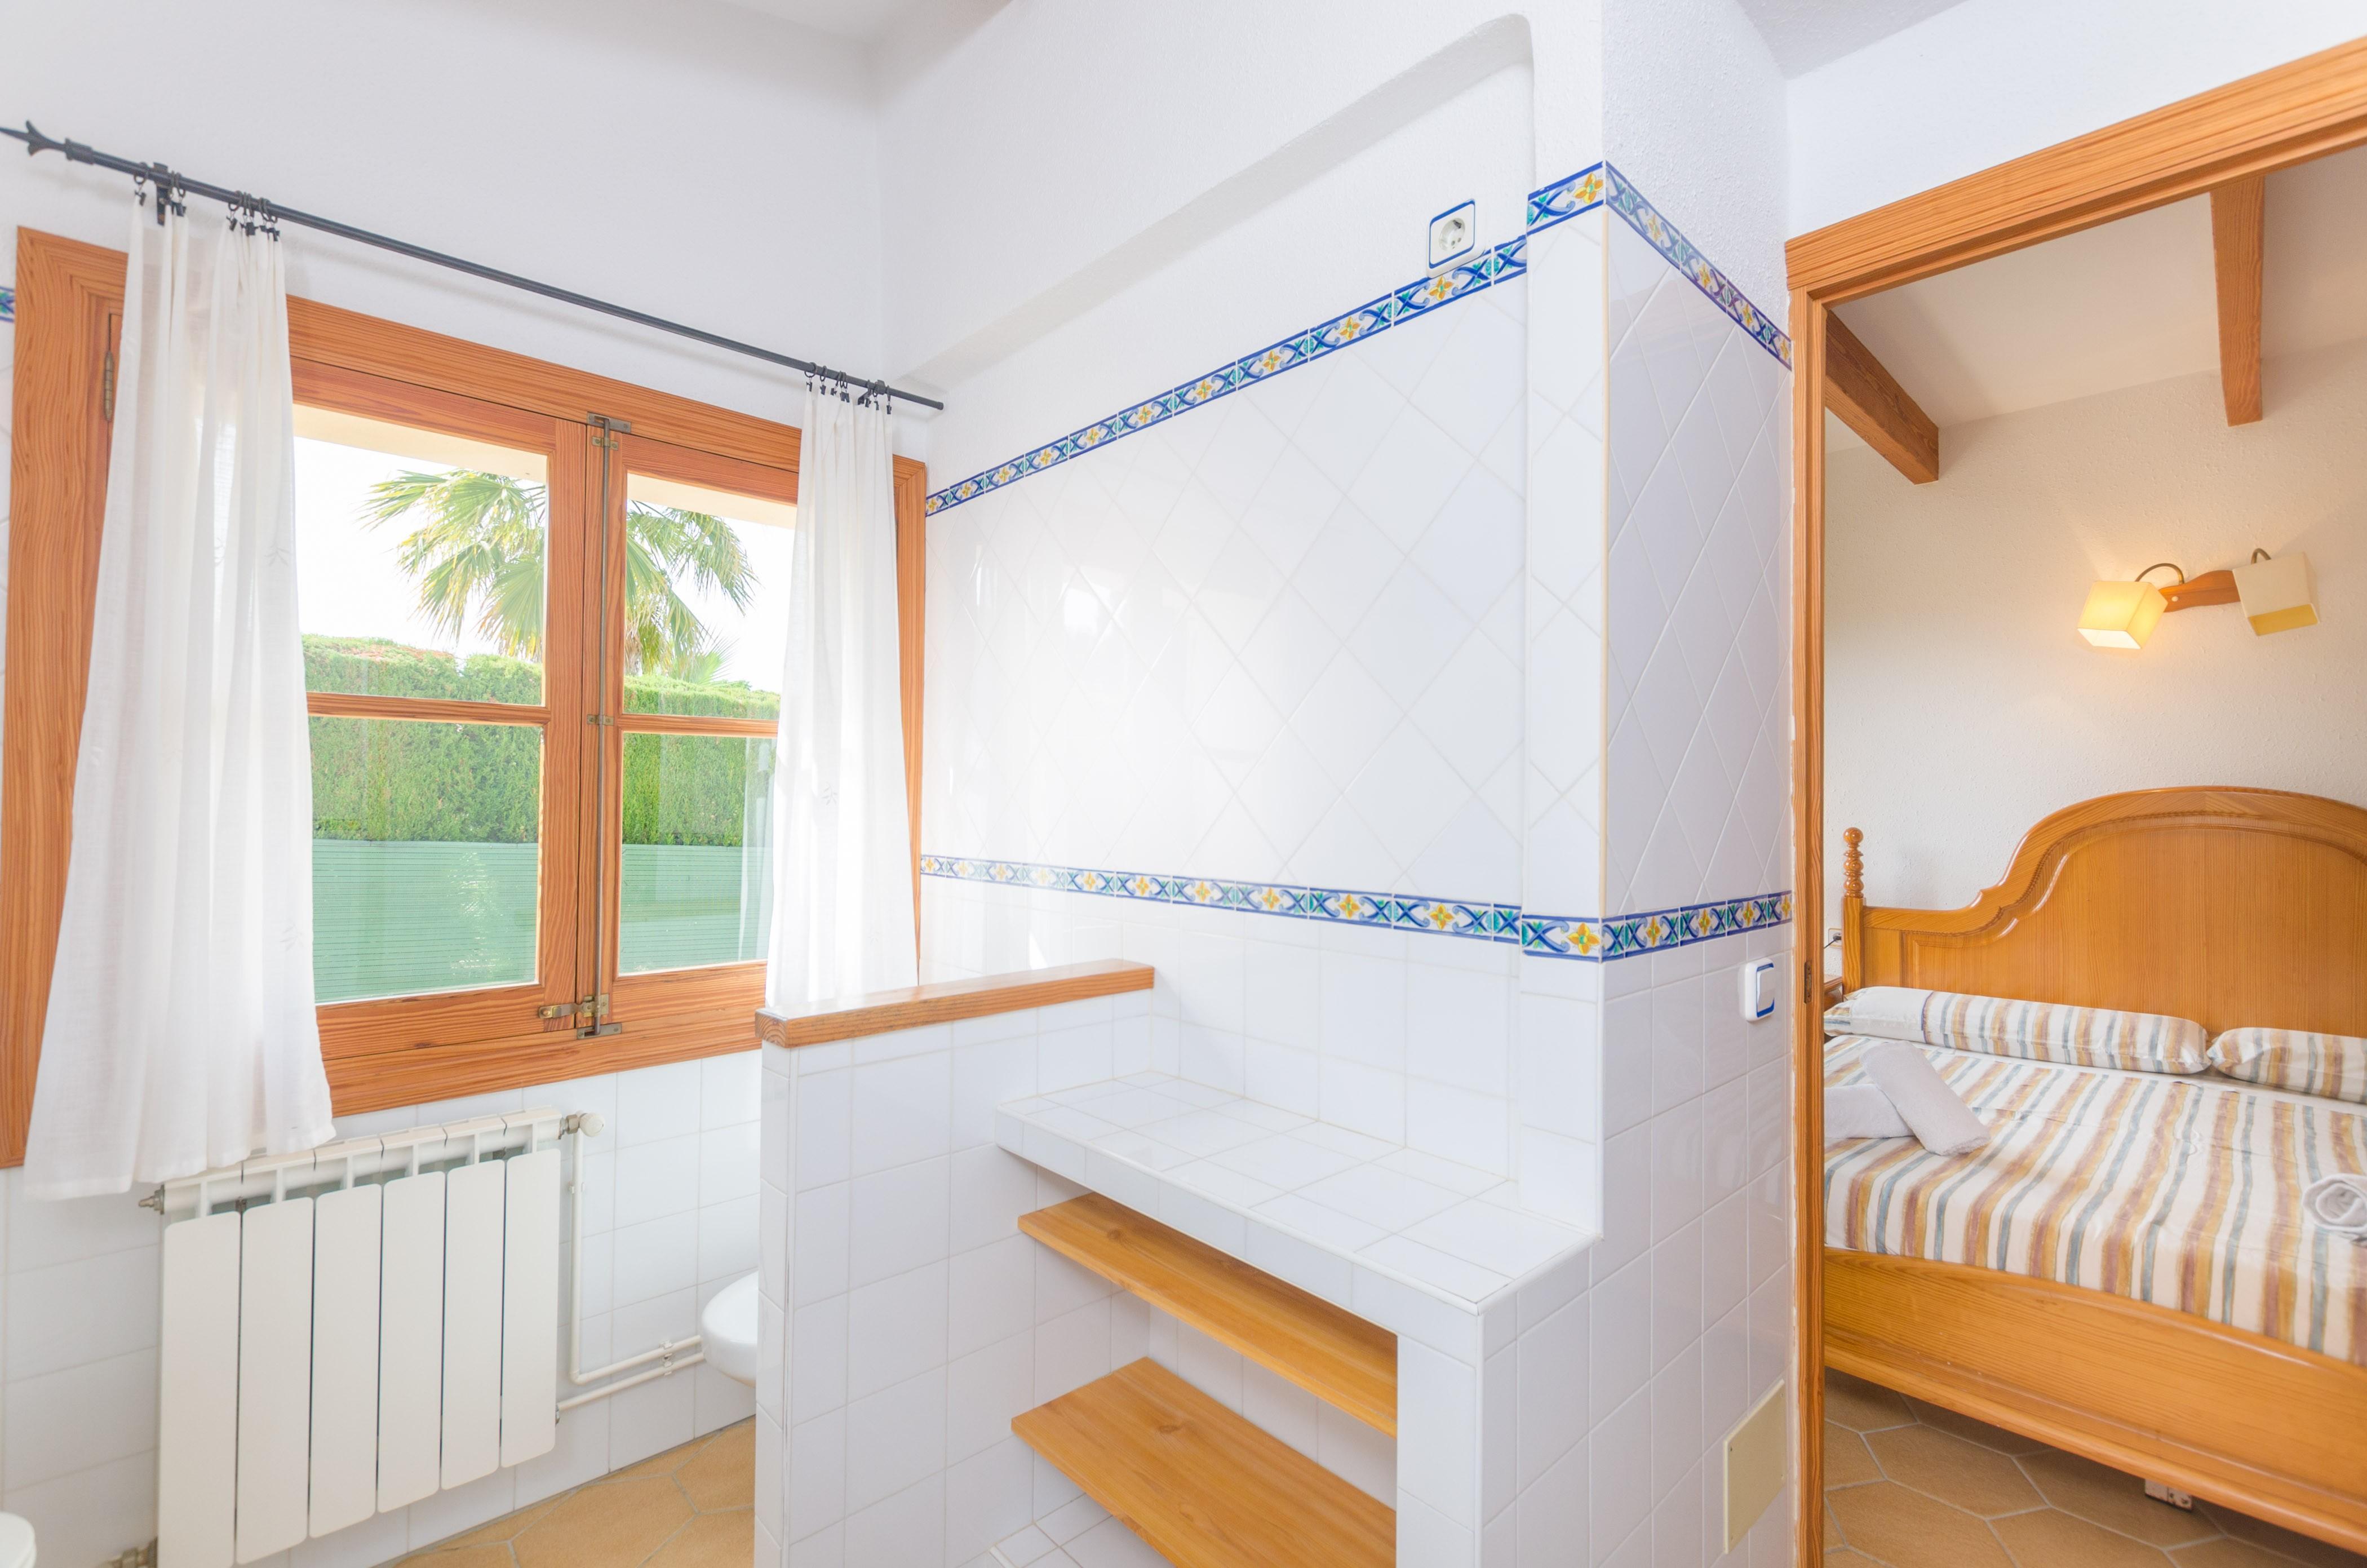 Maison de vacances SA SINIA (2374876), Lloret de Vistalegre, Majorque, Iles Baléares, Espagne, image 26